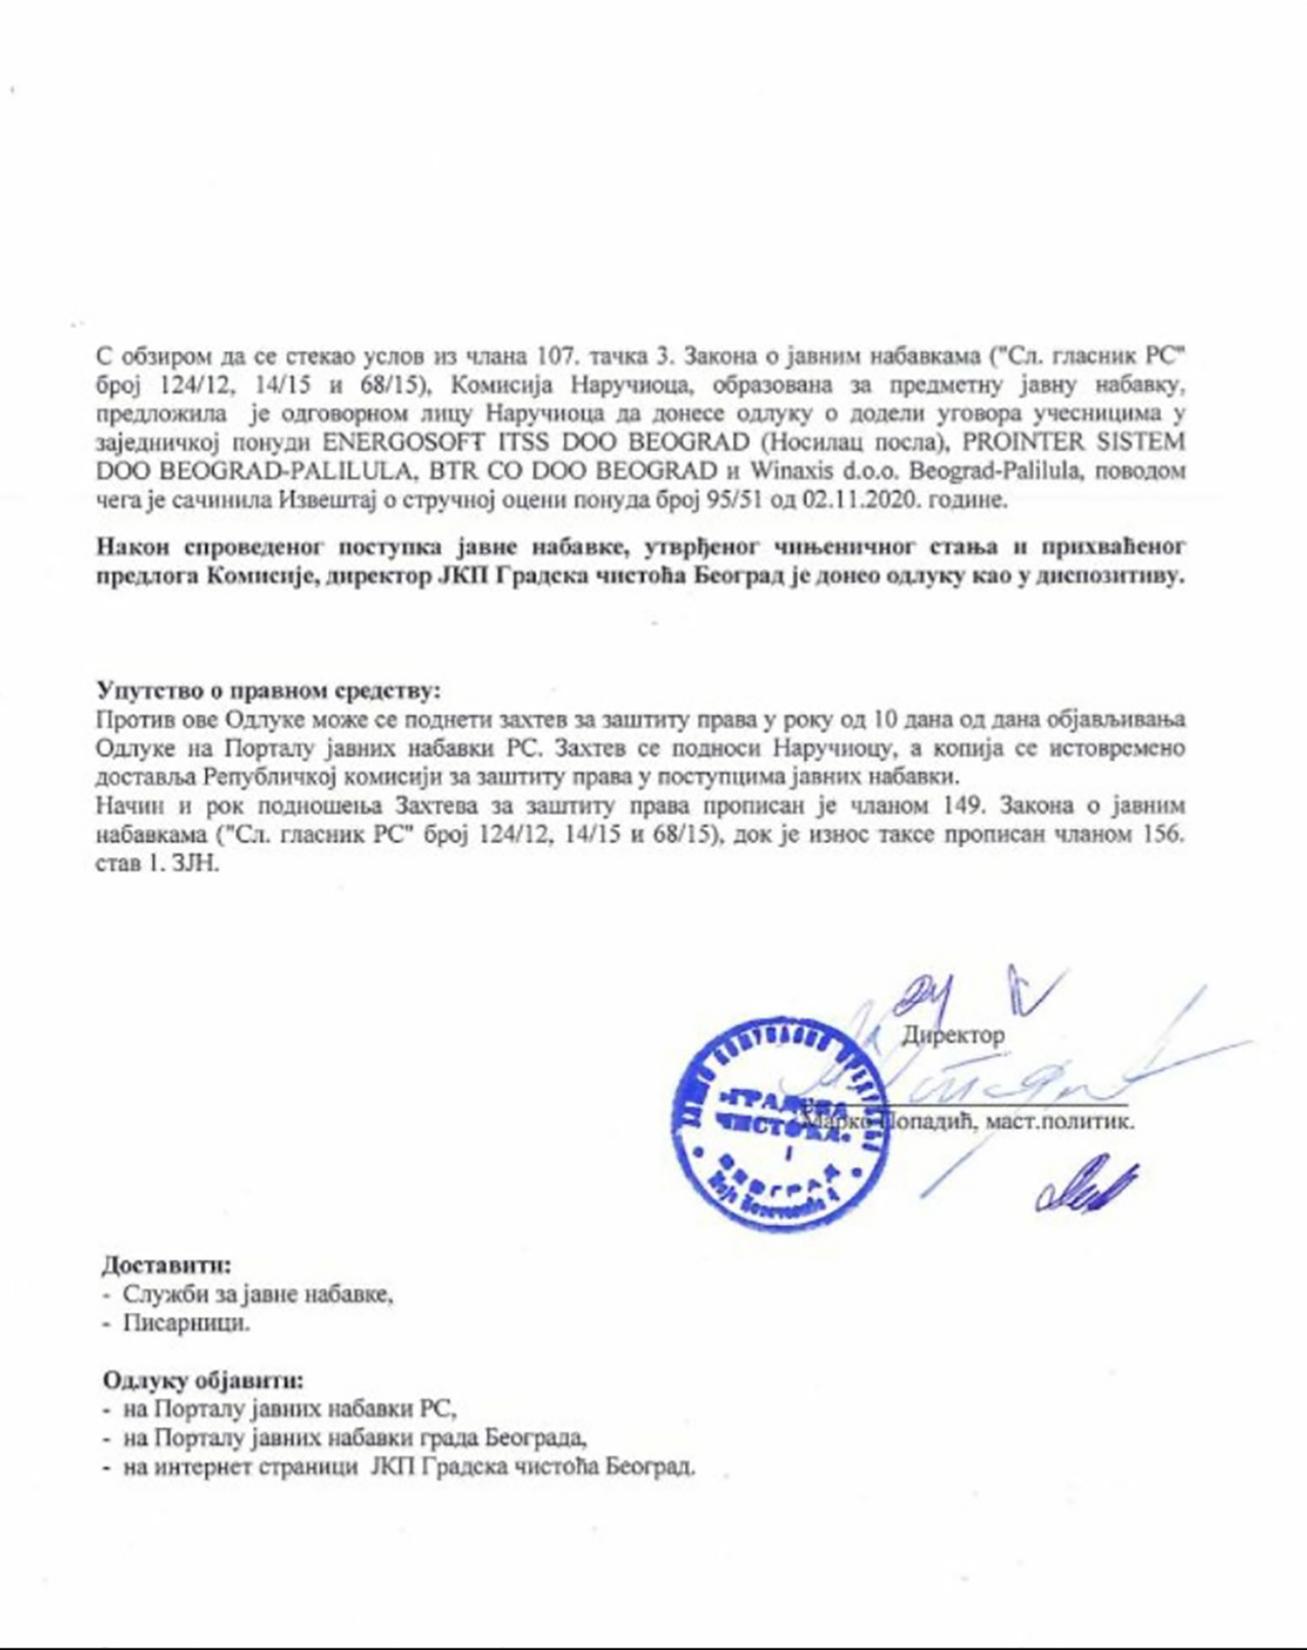 JKP Gradska čistoća, javna nabavka, tablet, dokument, papir, Željko Veselinović